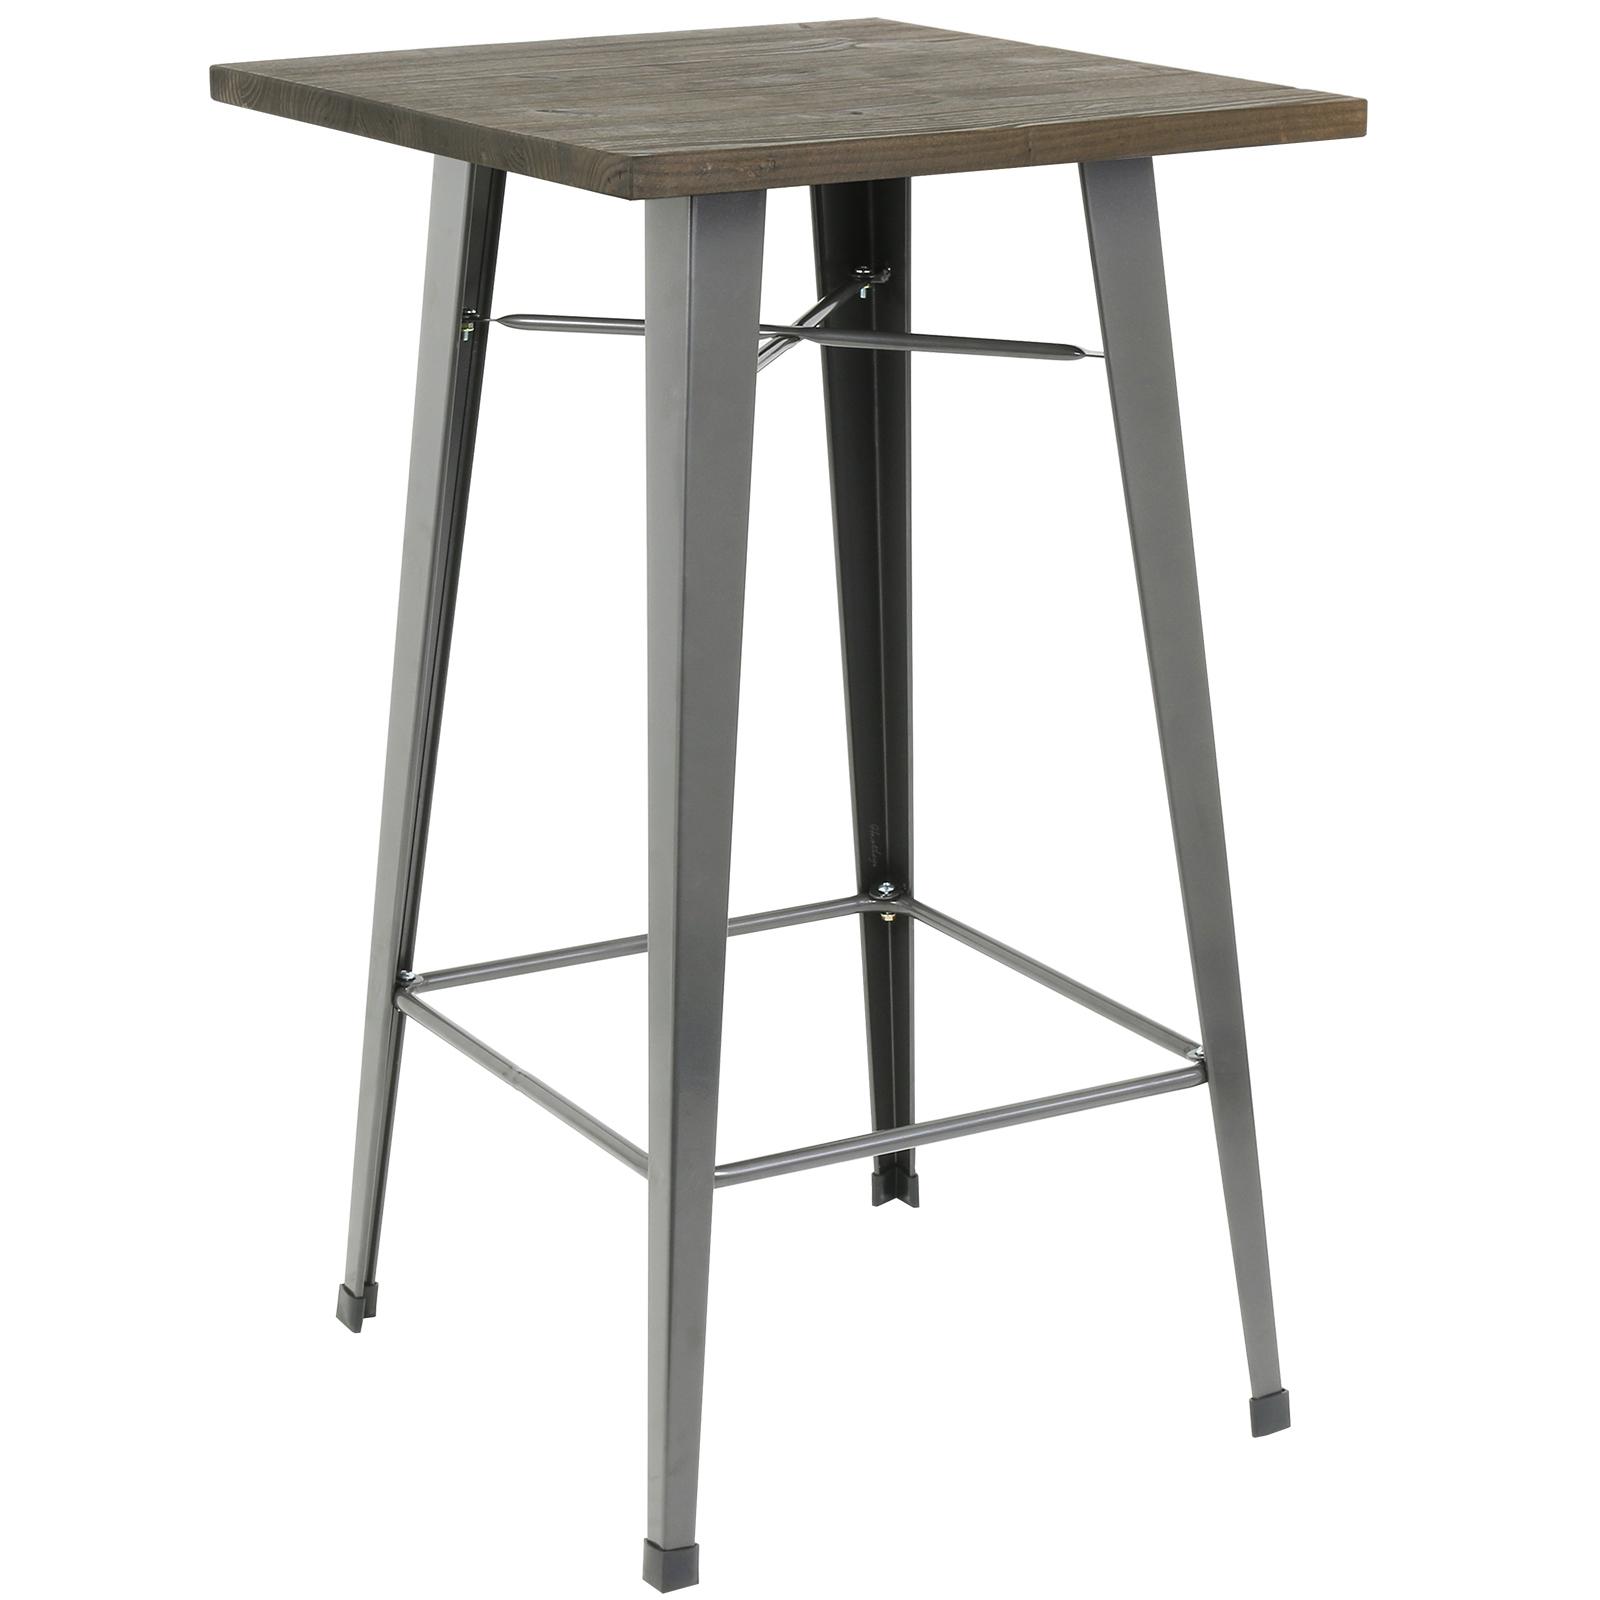 Hartleys tall wooden top metal bistro table industrial